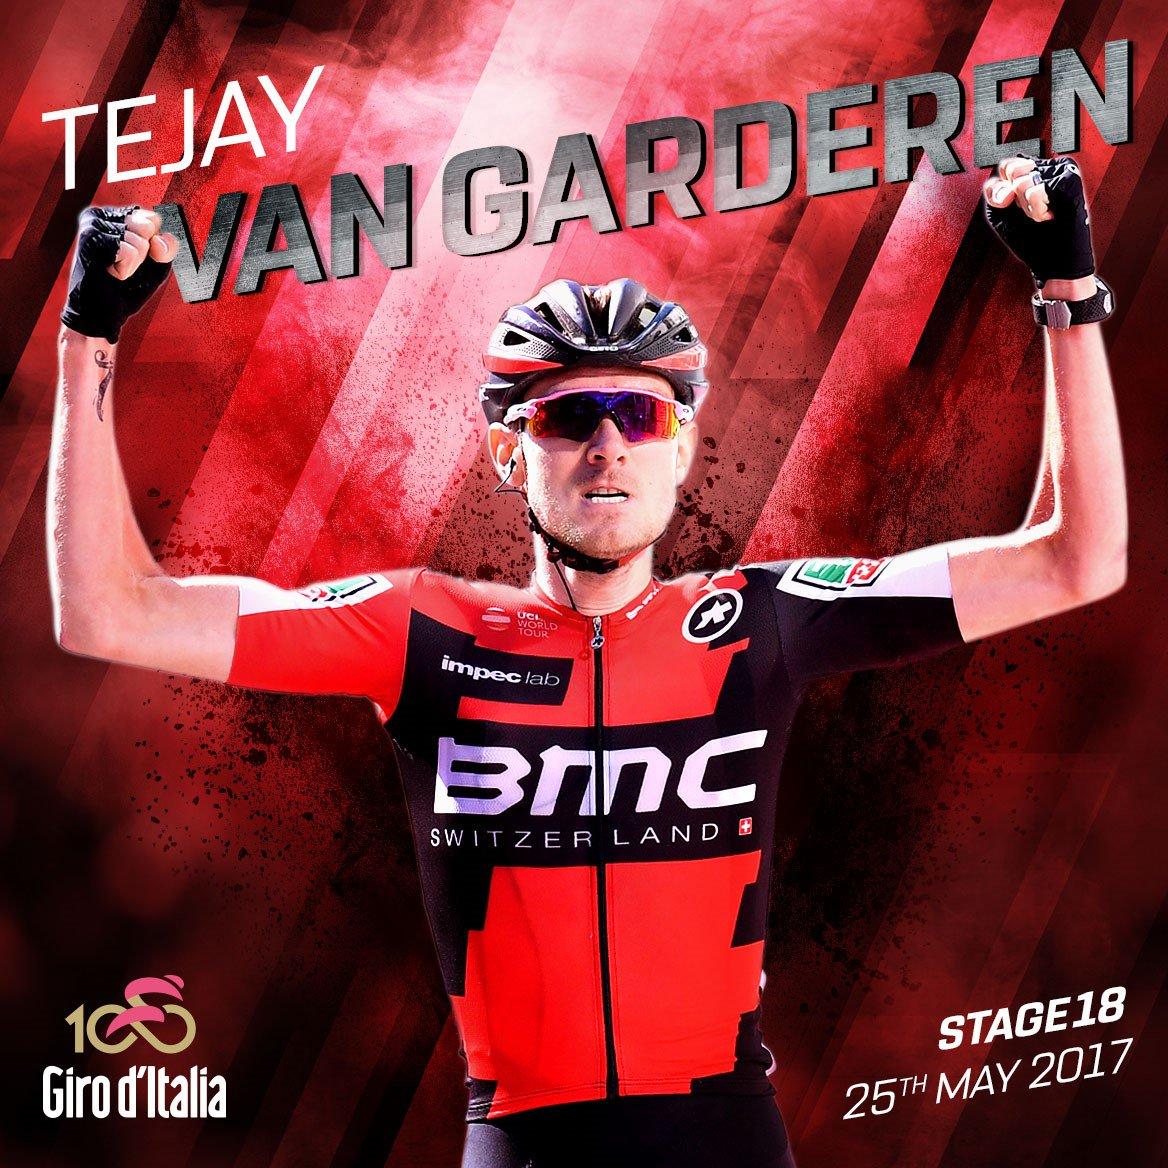 Giro d'Italia 2017: Van Garderen vince all'arrivo di Ortisei. Nibali e Quintana controllano Dumoulin Maglia Rosa